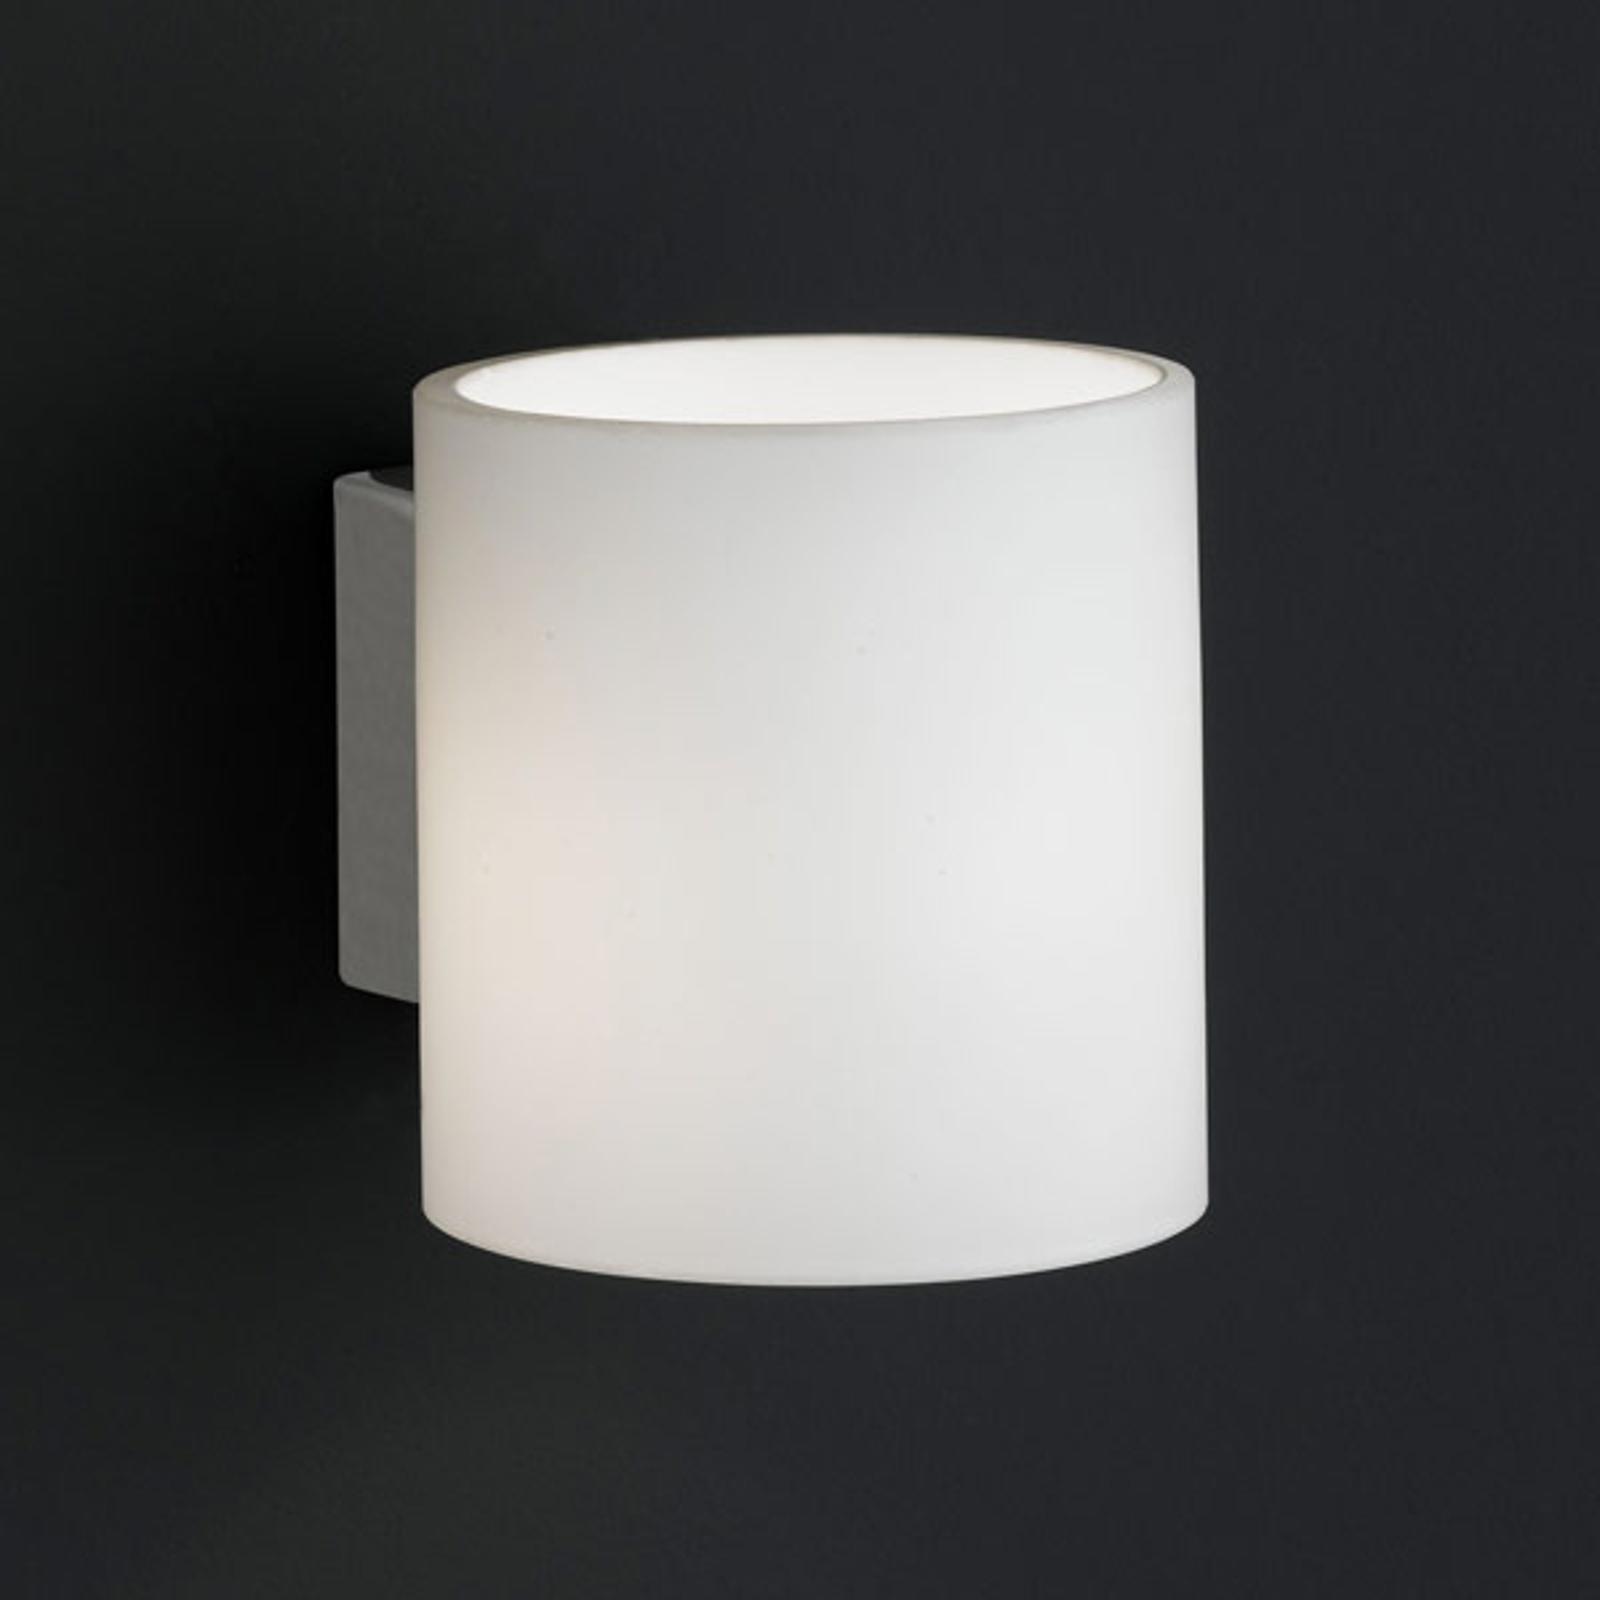 Vegglampe Aquaba med vippebryter